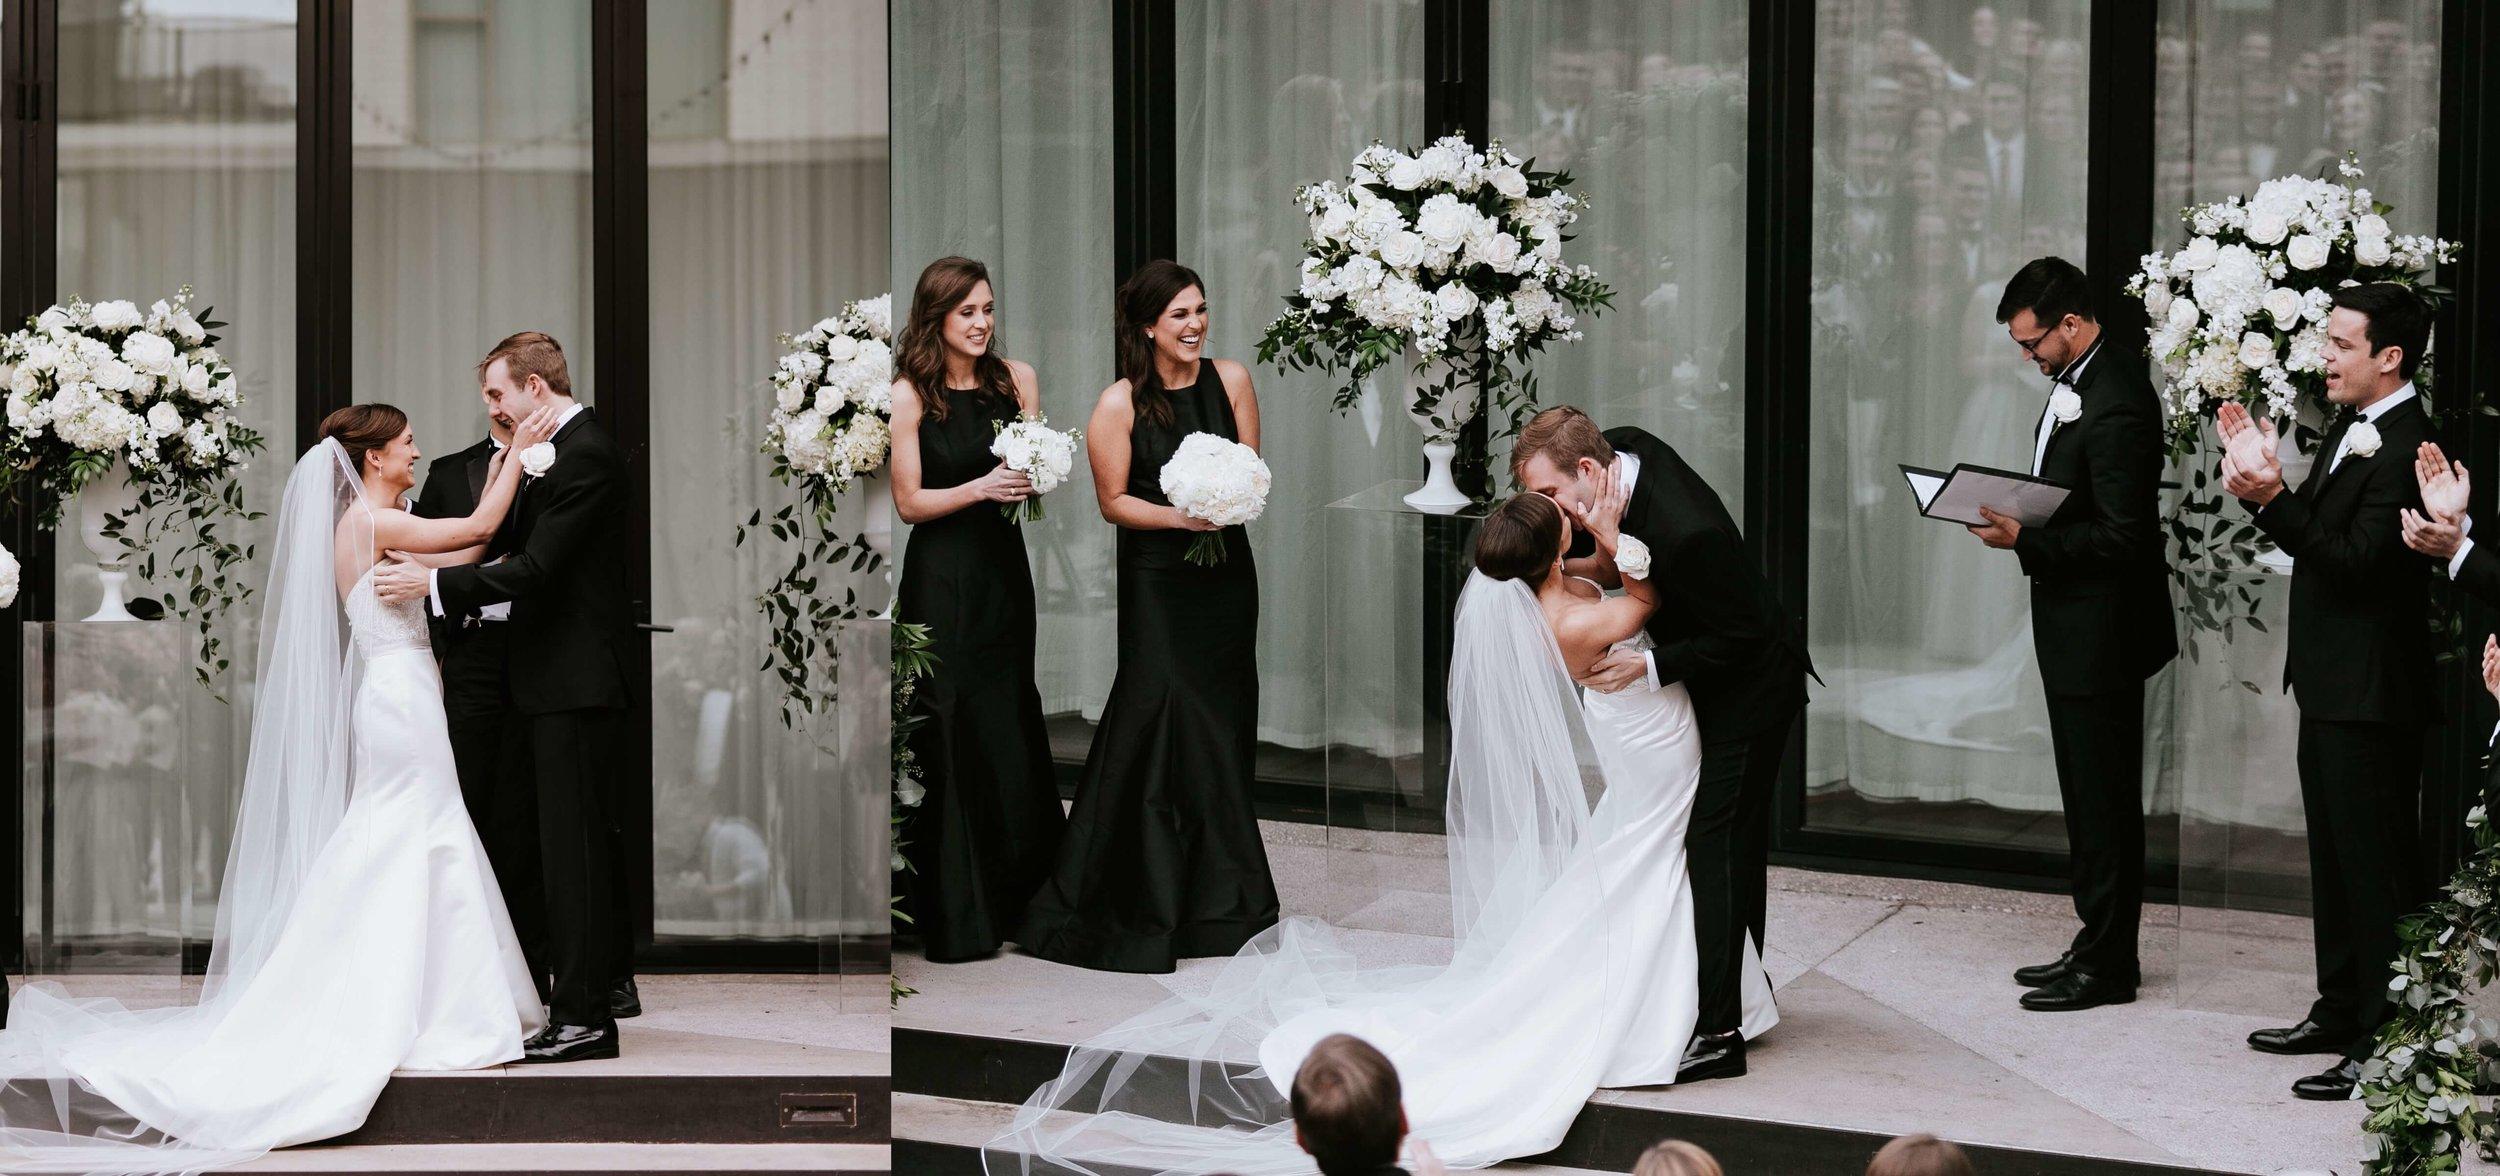 McGough Wedding451 copy.jpg